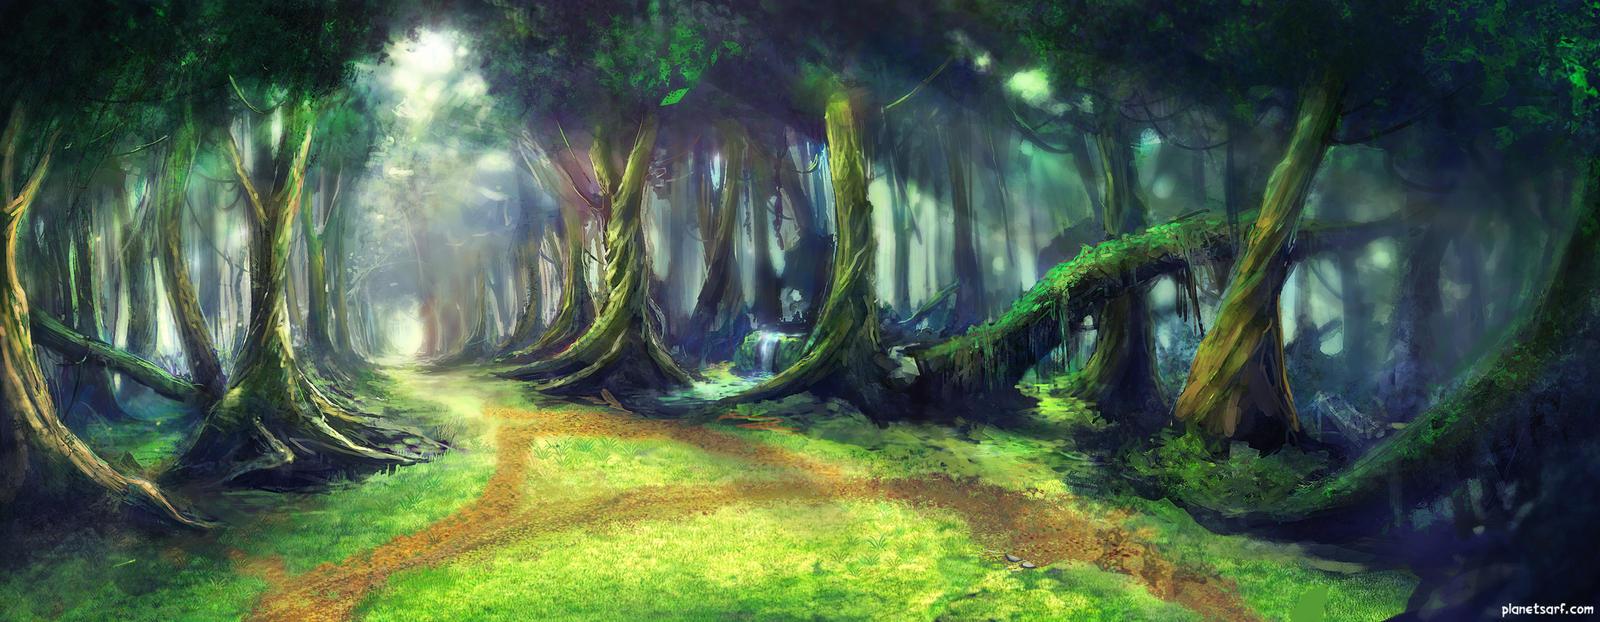 SARF Jungle Background by abigbat